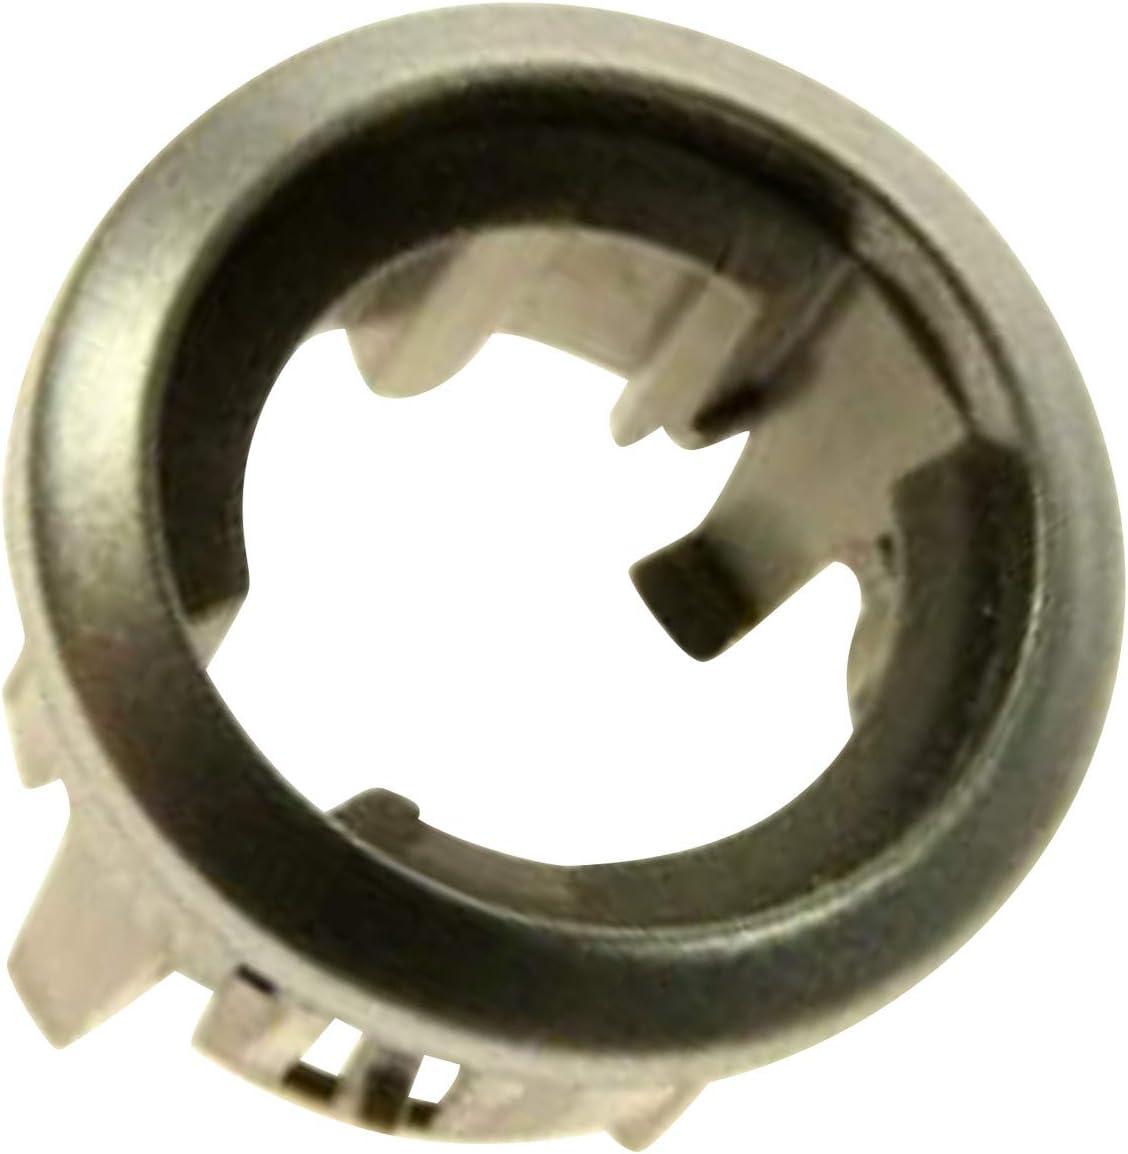 Pulsador 3311 Horno microondas 481241259102 Whirlpool BAUKNECHT